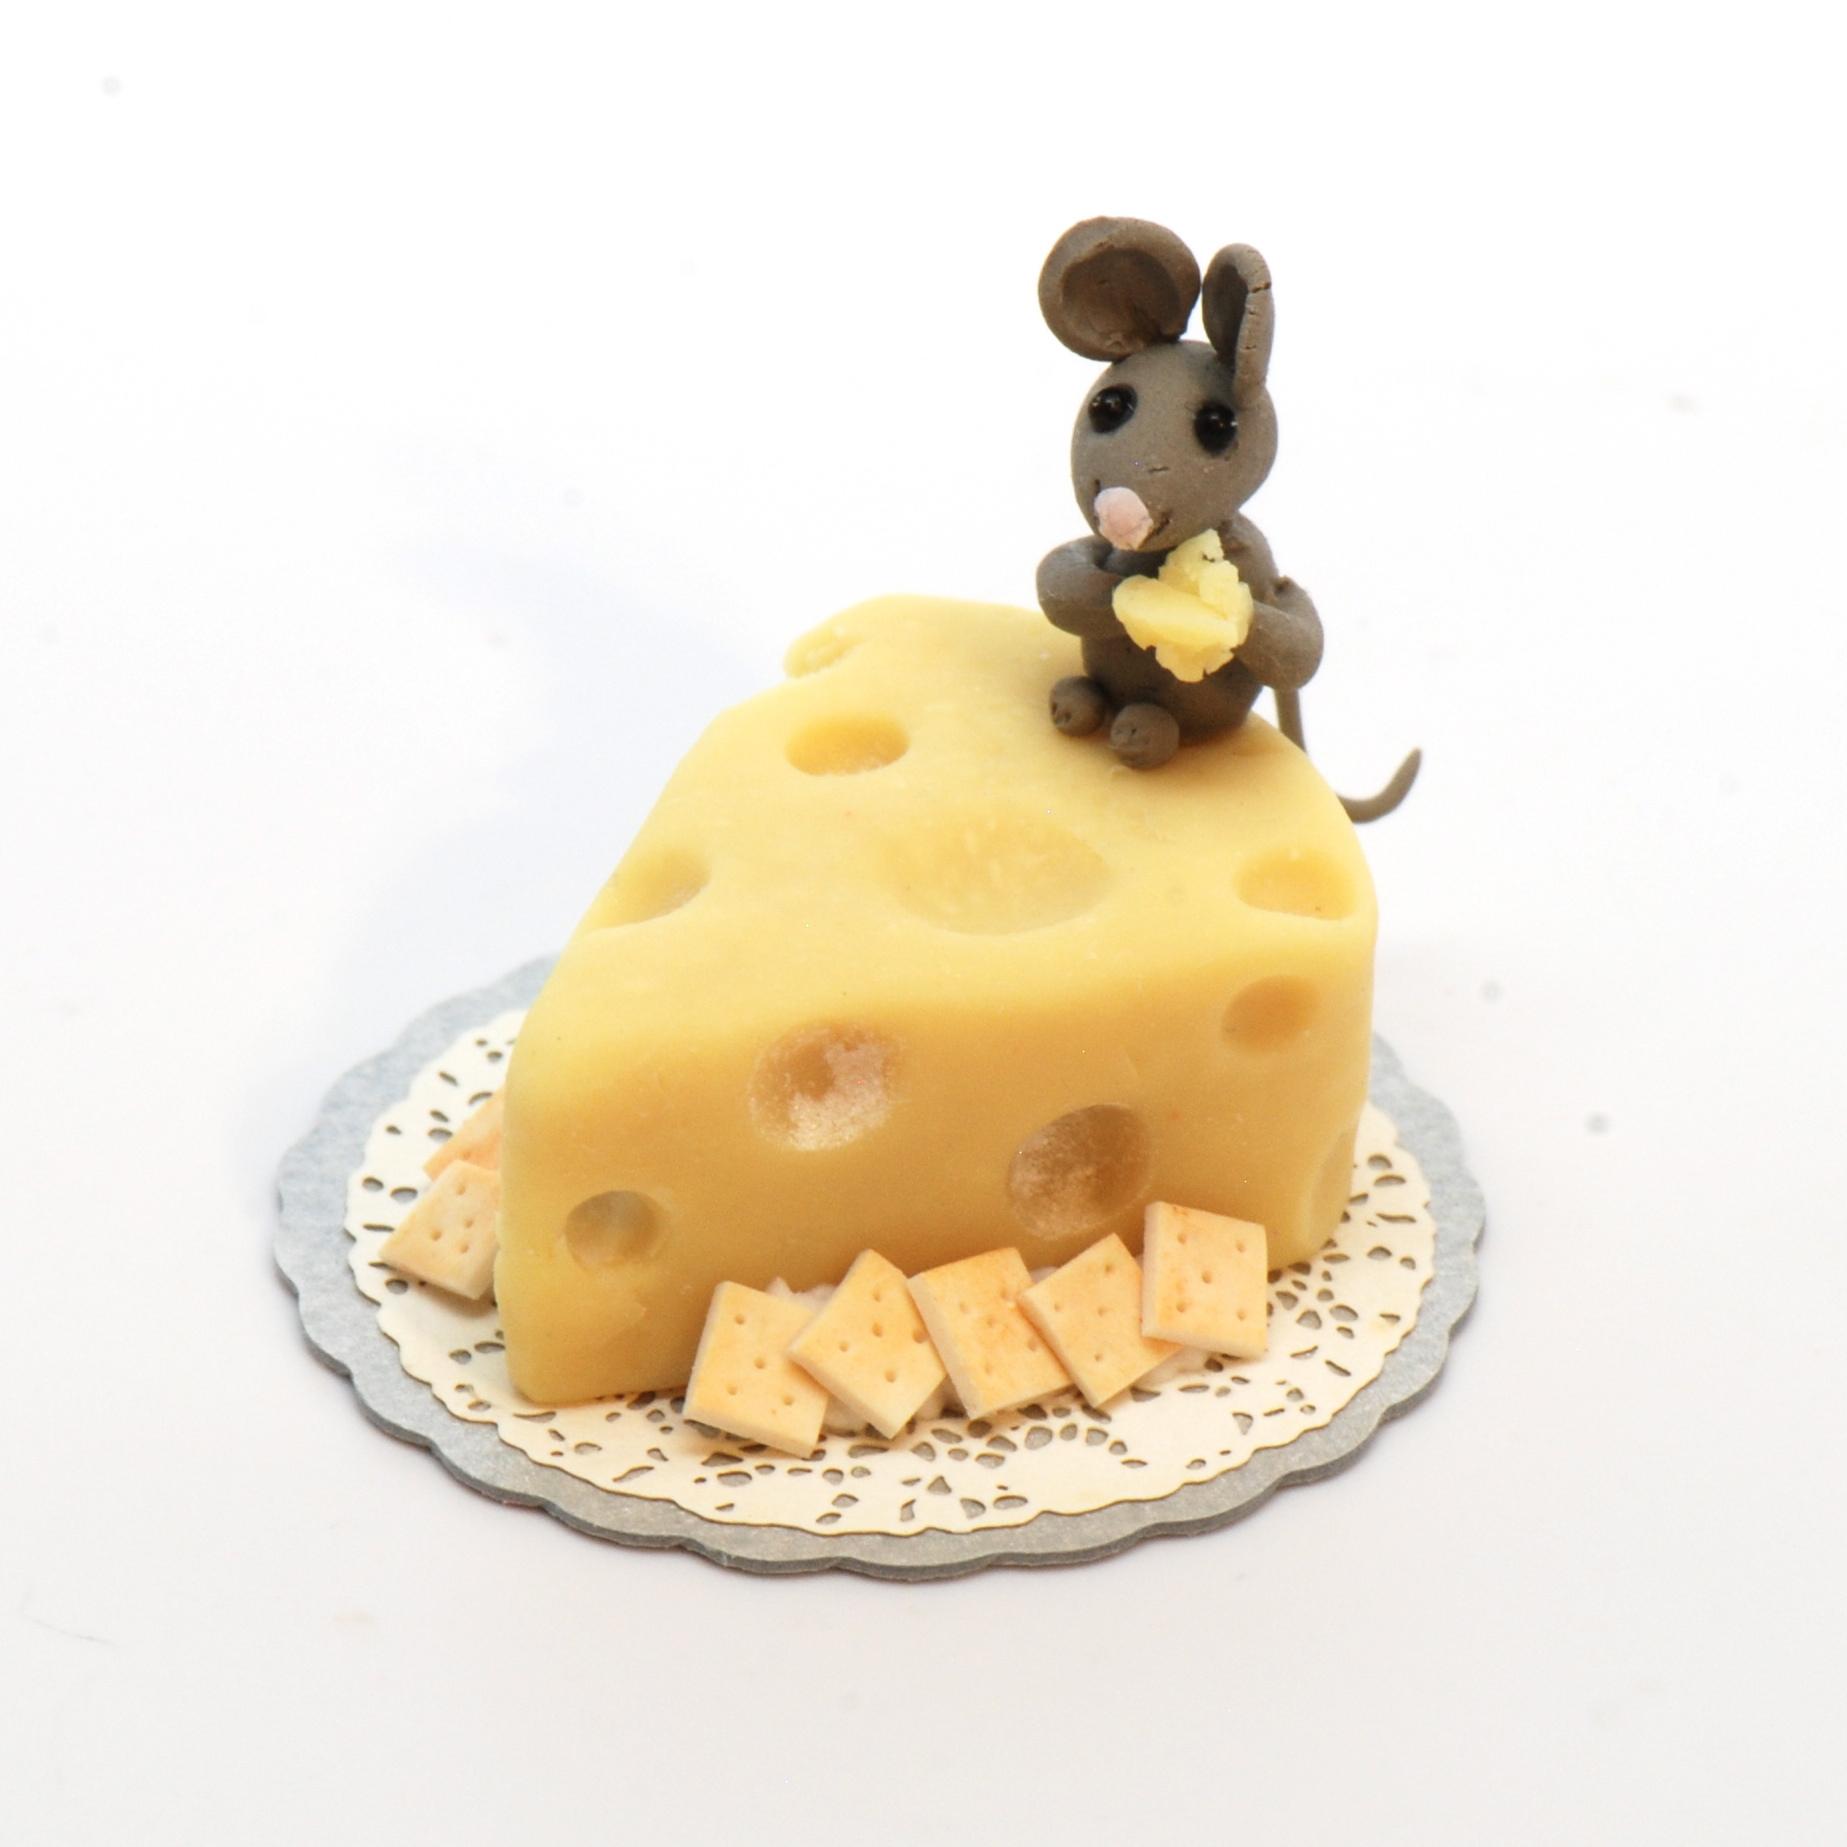 The Original Pumpkin Crunch Cake with Cream Cheese